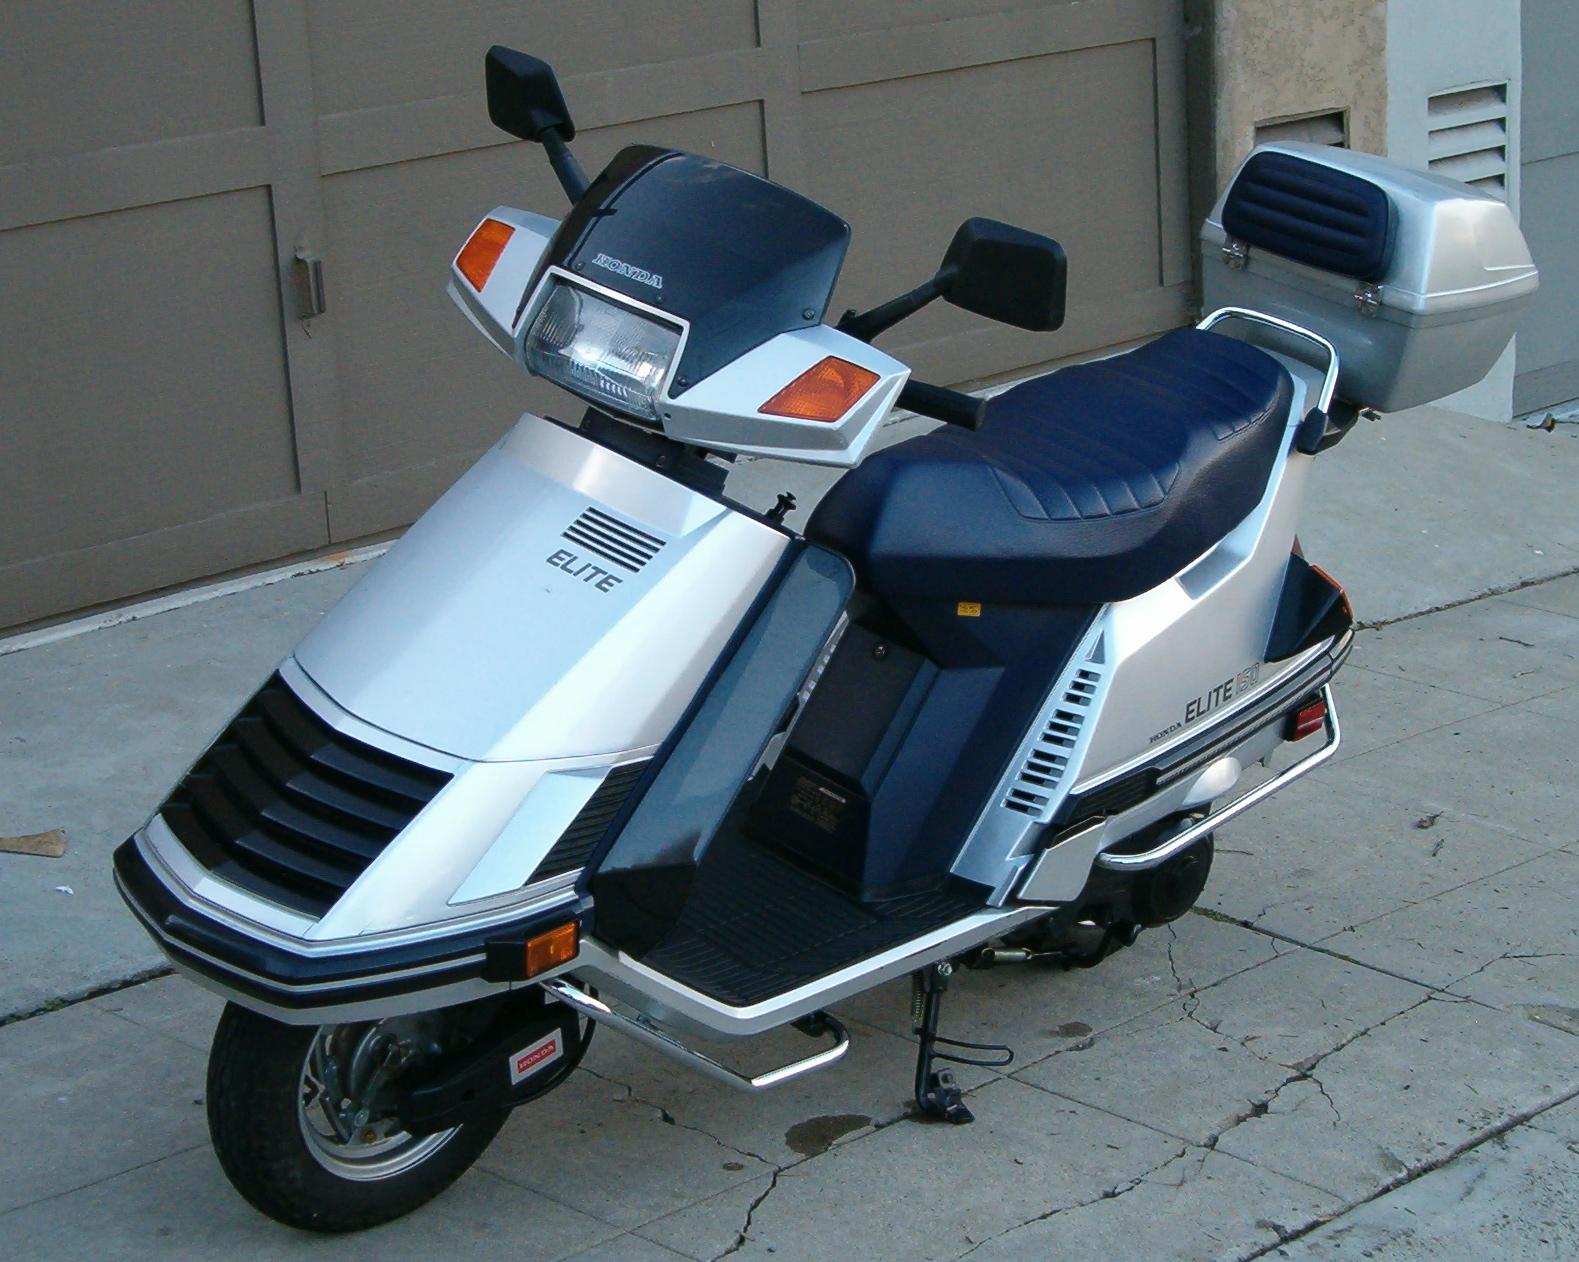 Honda Elite 150 125 Pictures Autocycle